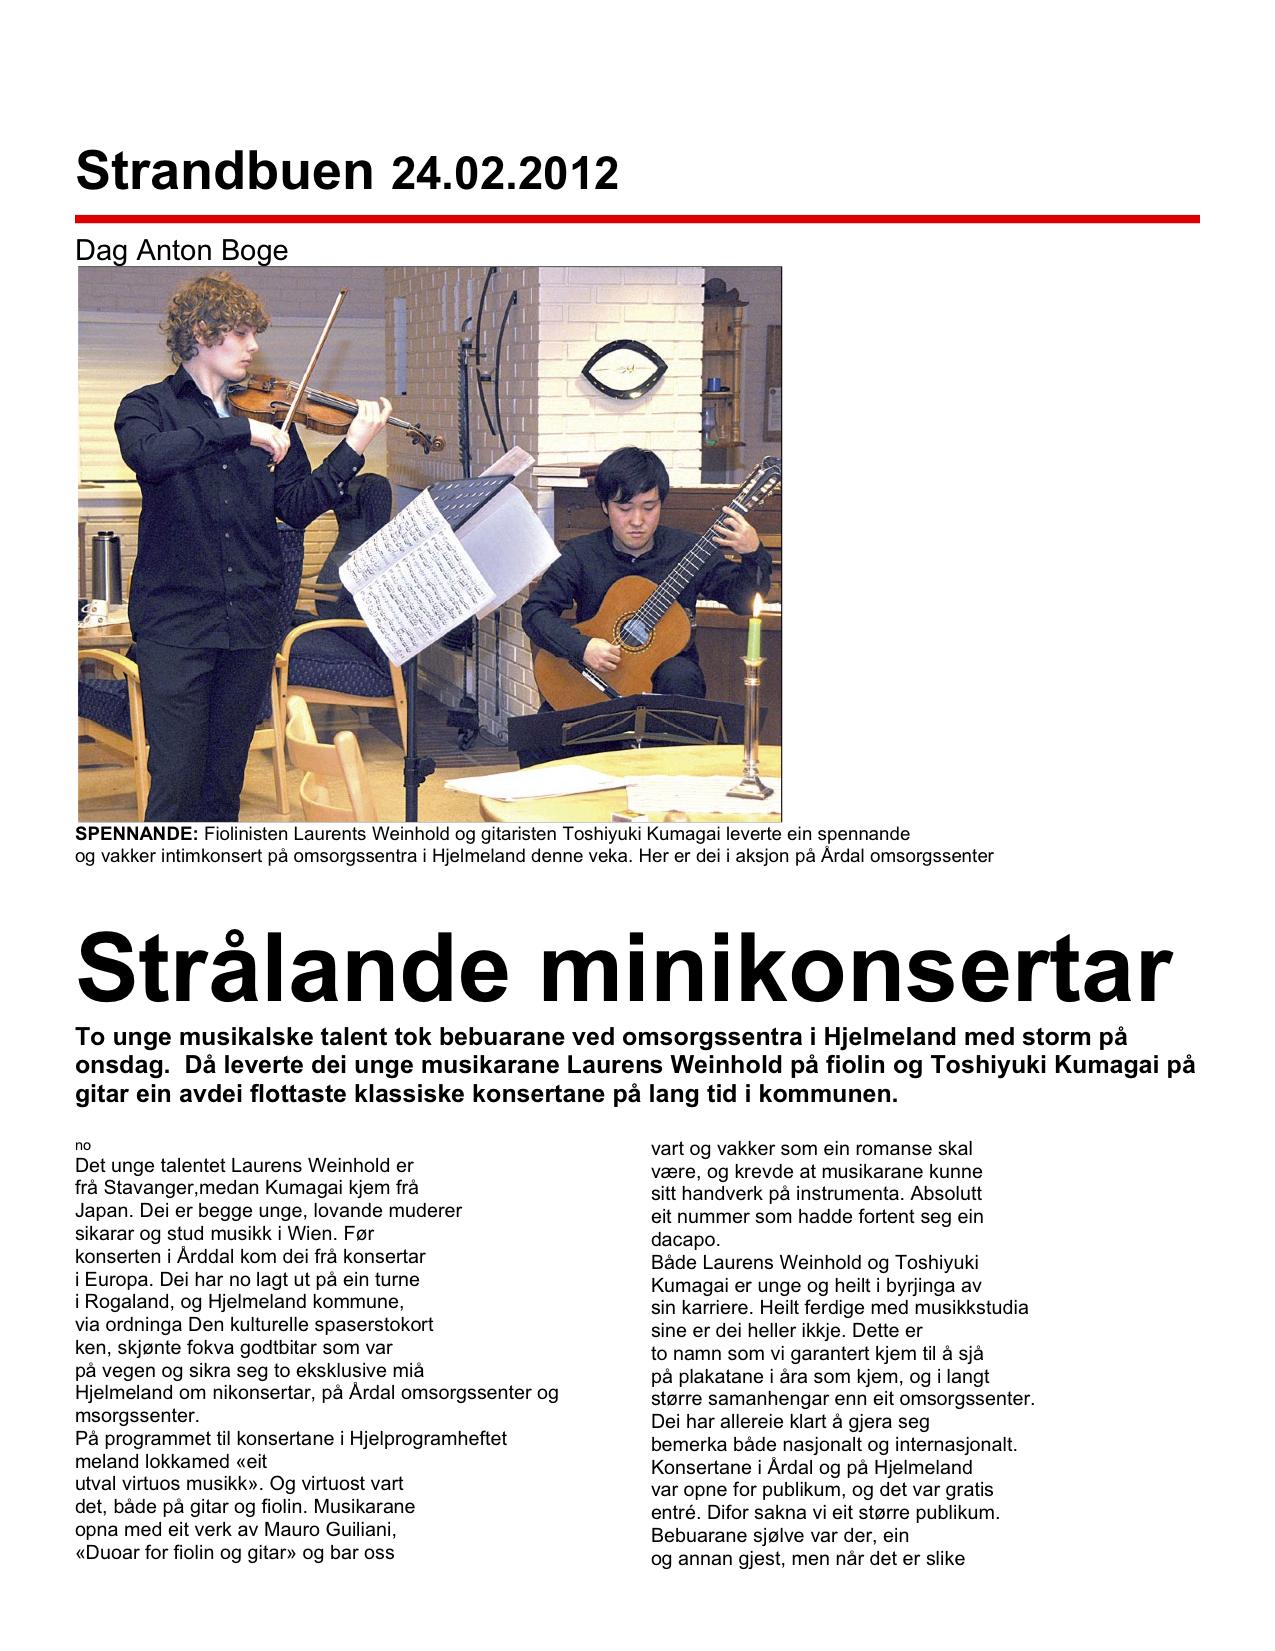 Strandbuen, February 24th 2012